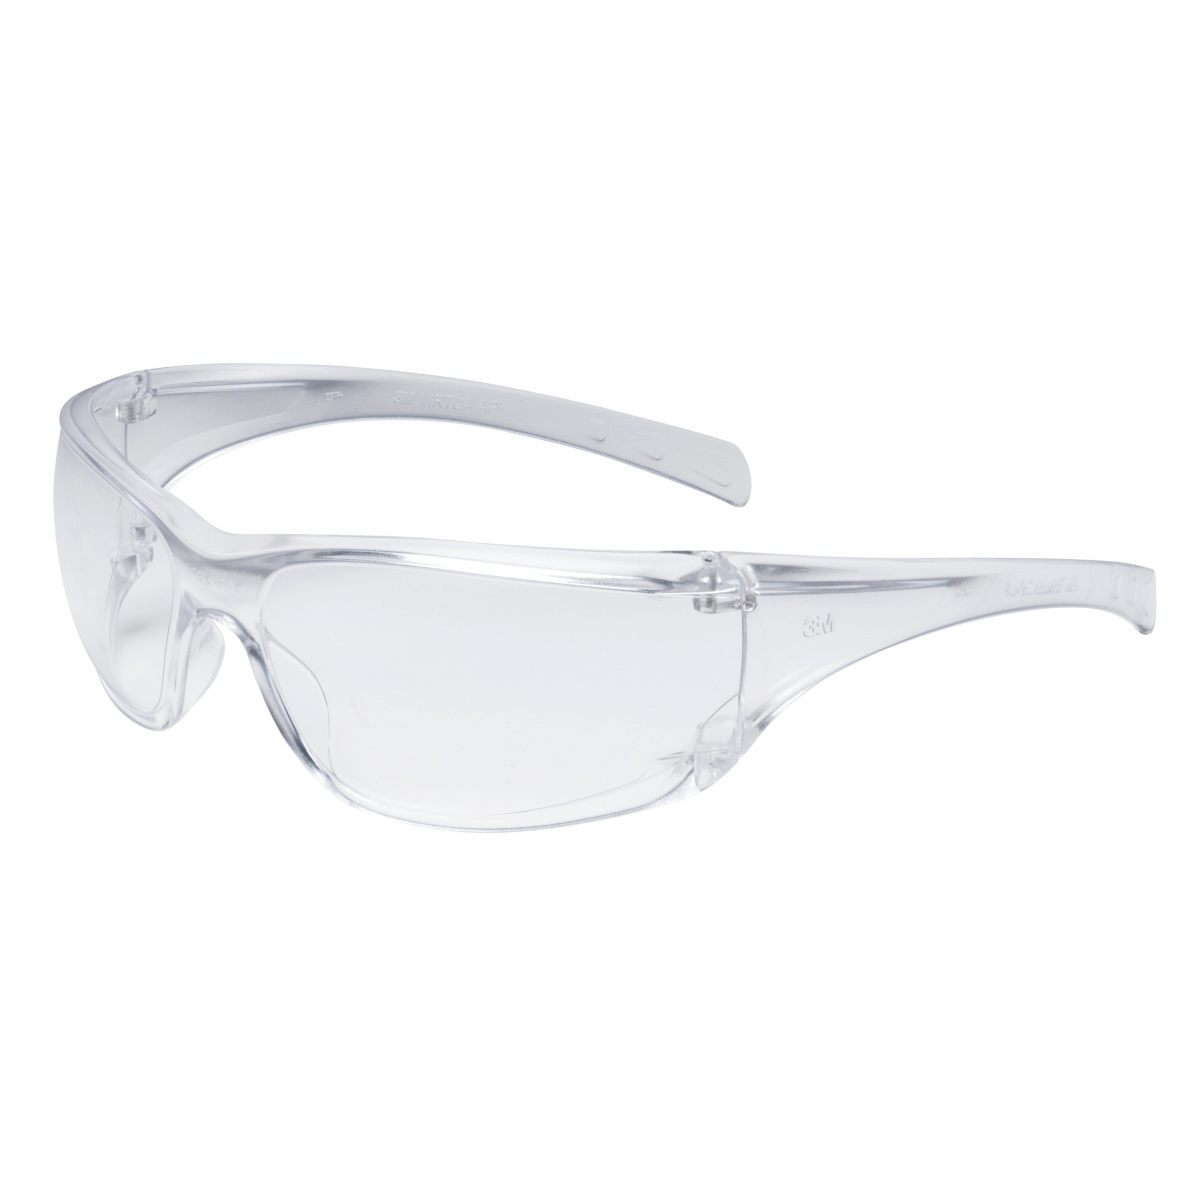 SAFETY GLASSES ANSI Z87.1 /& CSA Z94 US Standard 1ea in pkg Clear /& Gray Lens